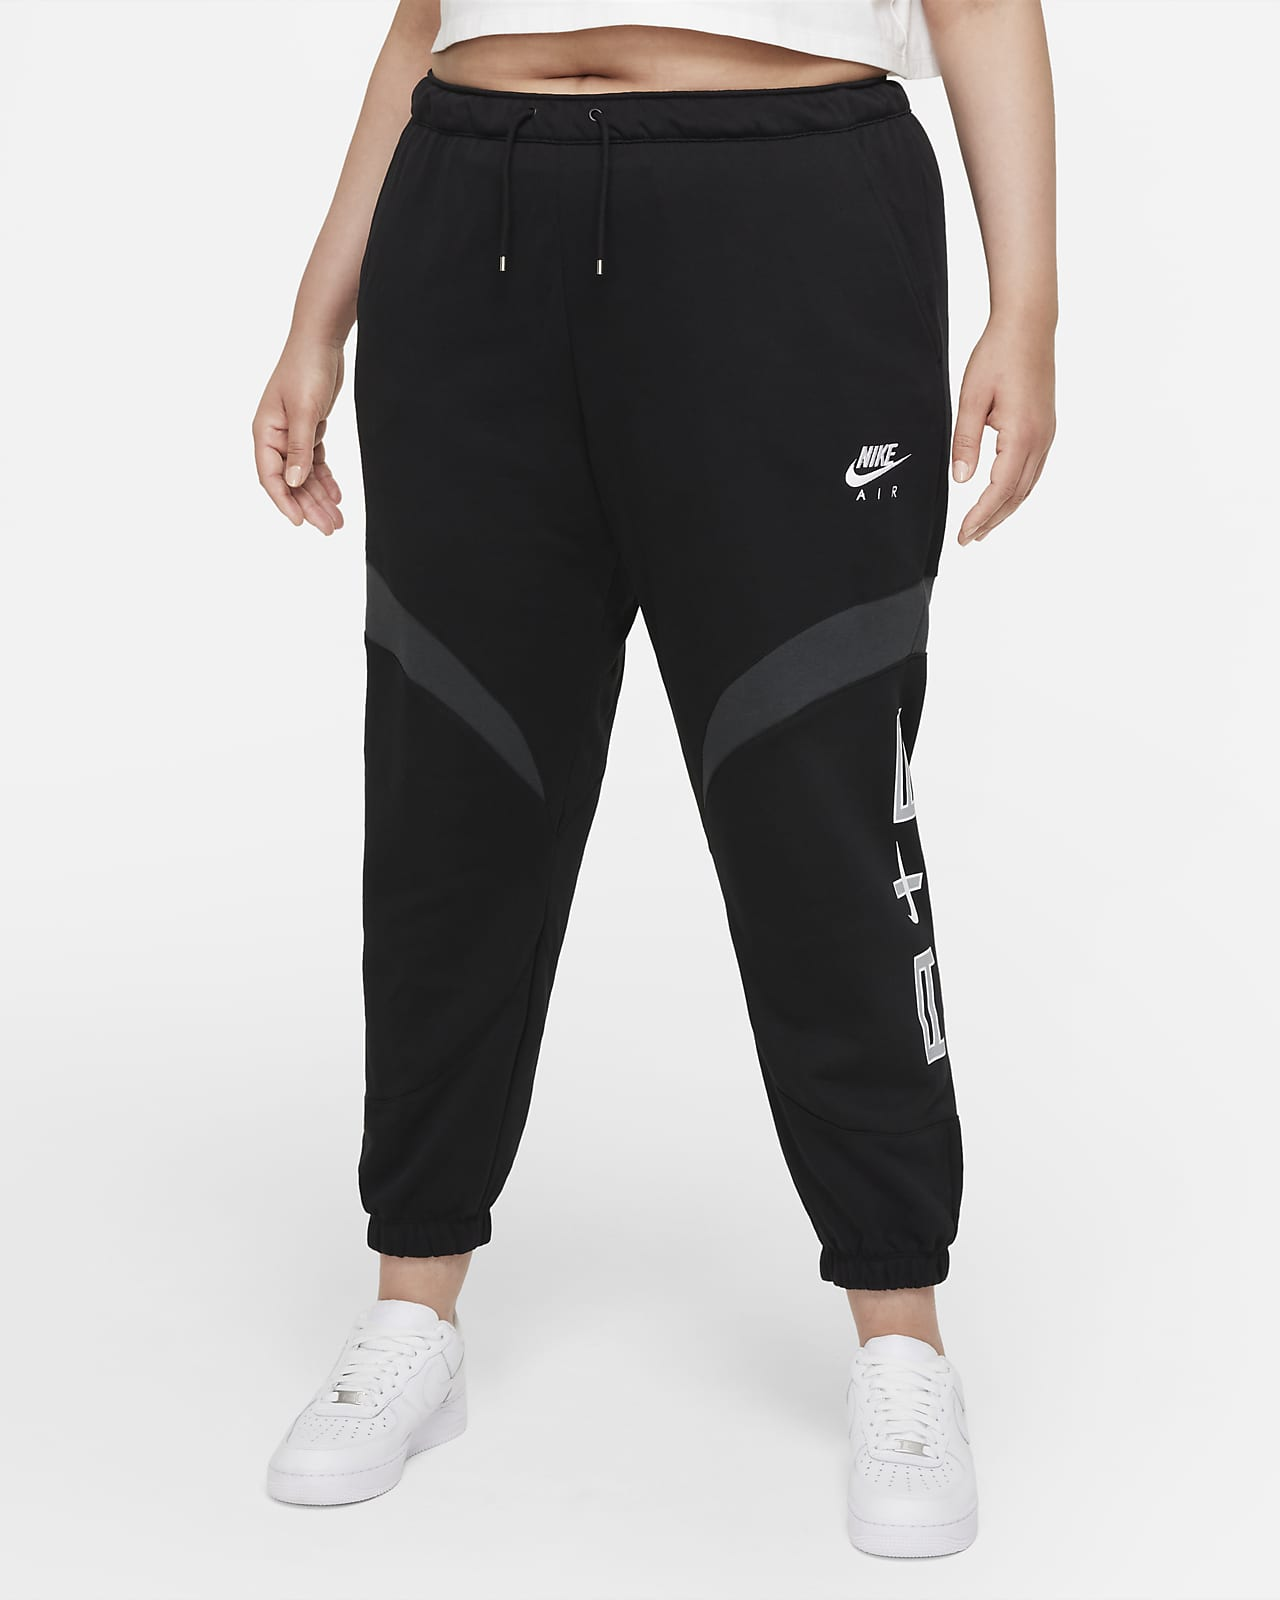 Nike Air Women's Joggers (Plus Size)